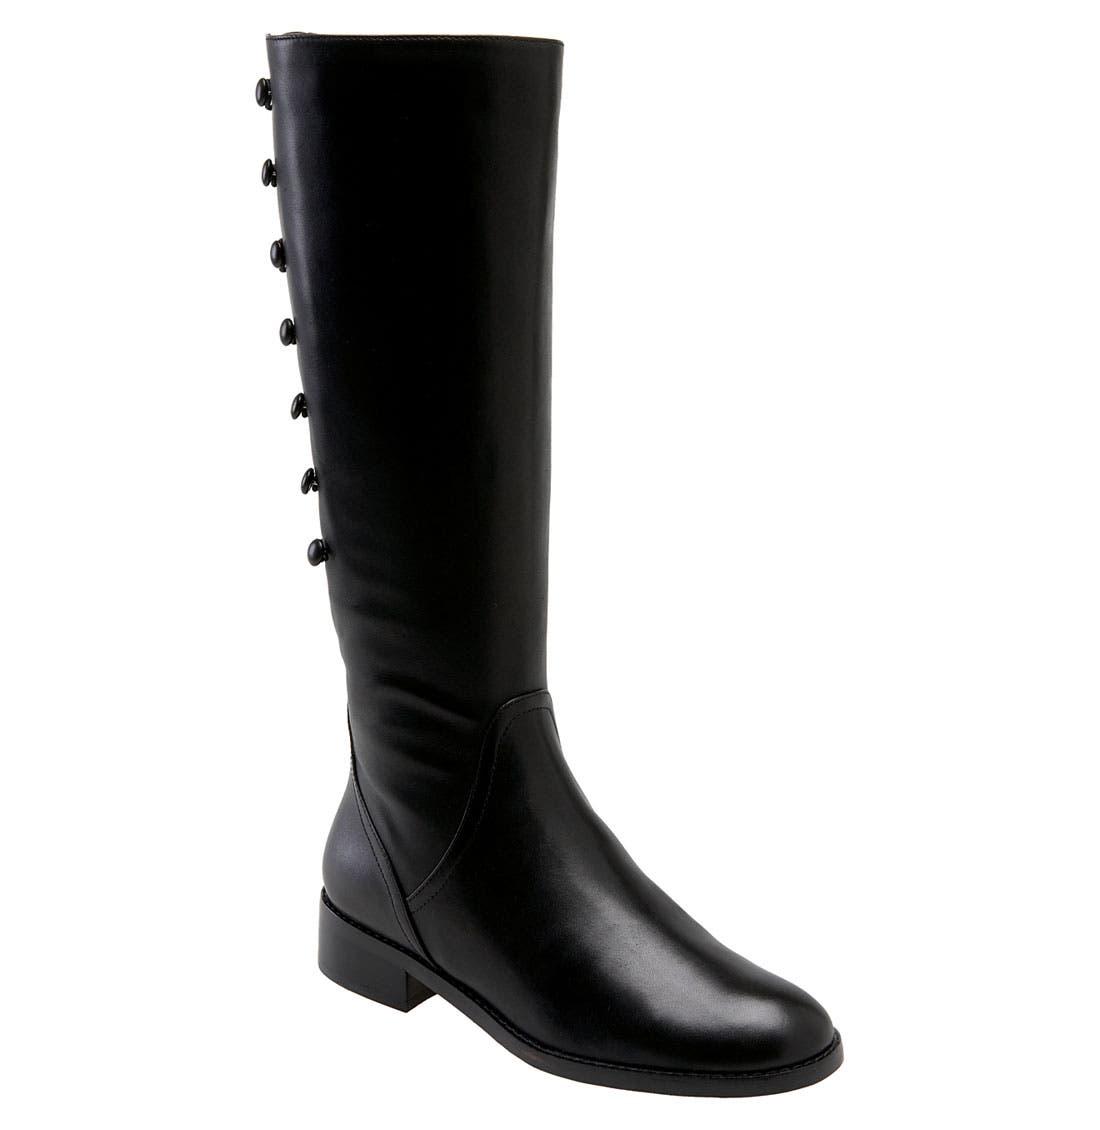 Alternate Image 1 Selected - Sanzia 'Vintage' Flat Boot